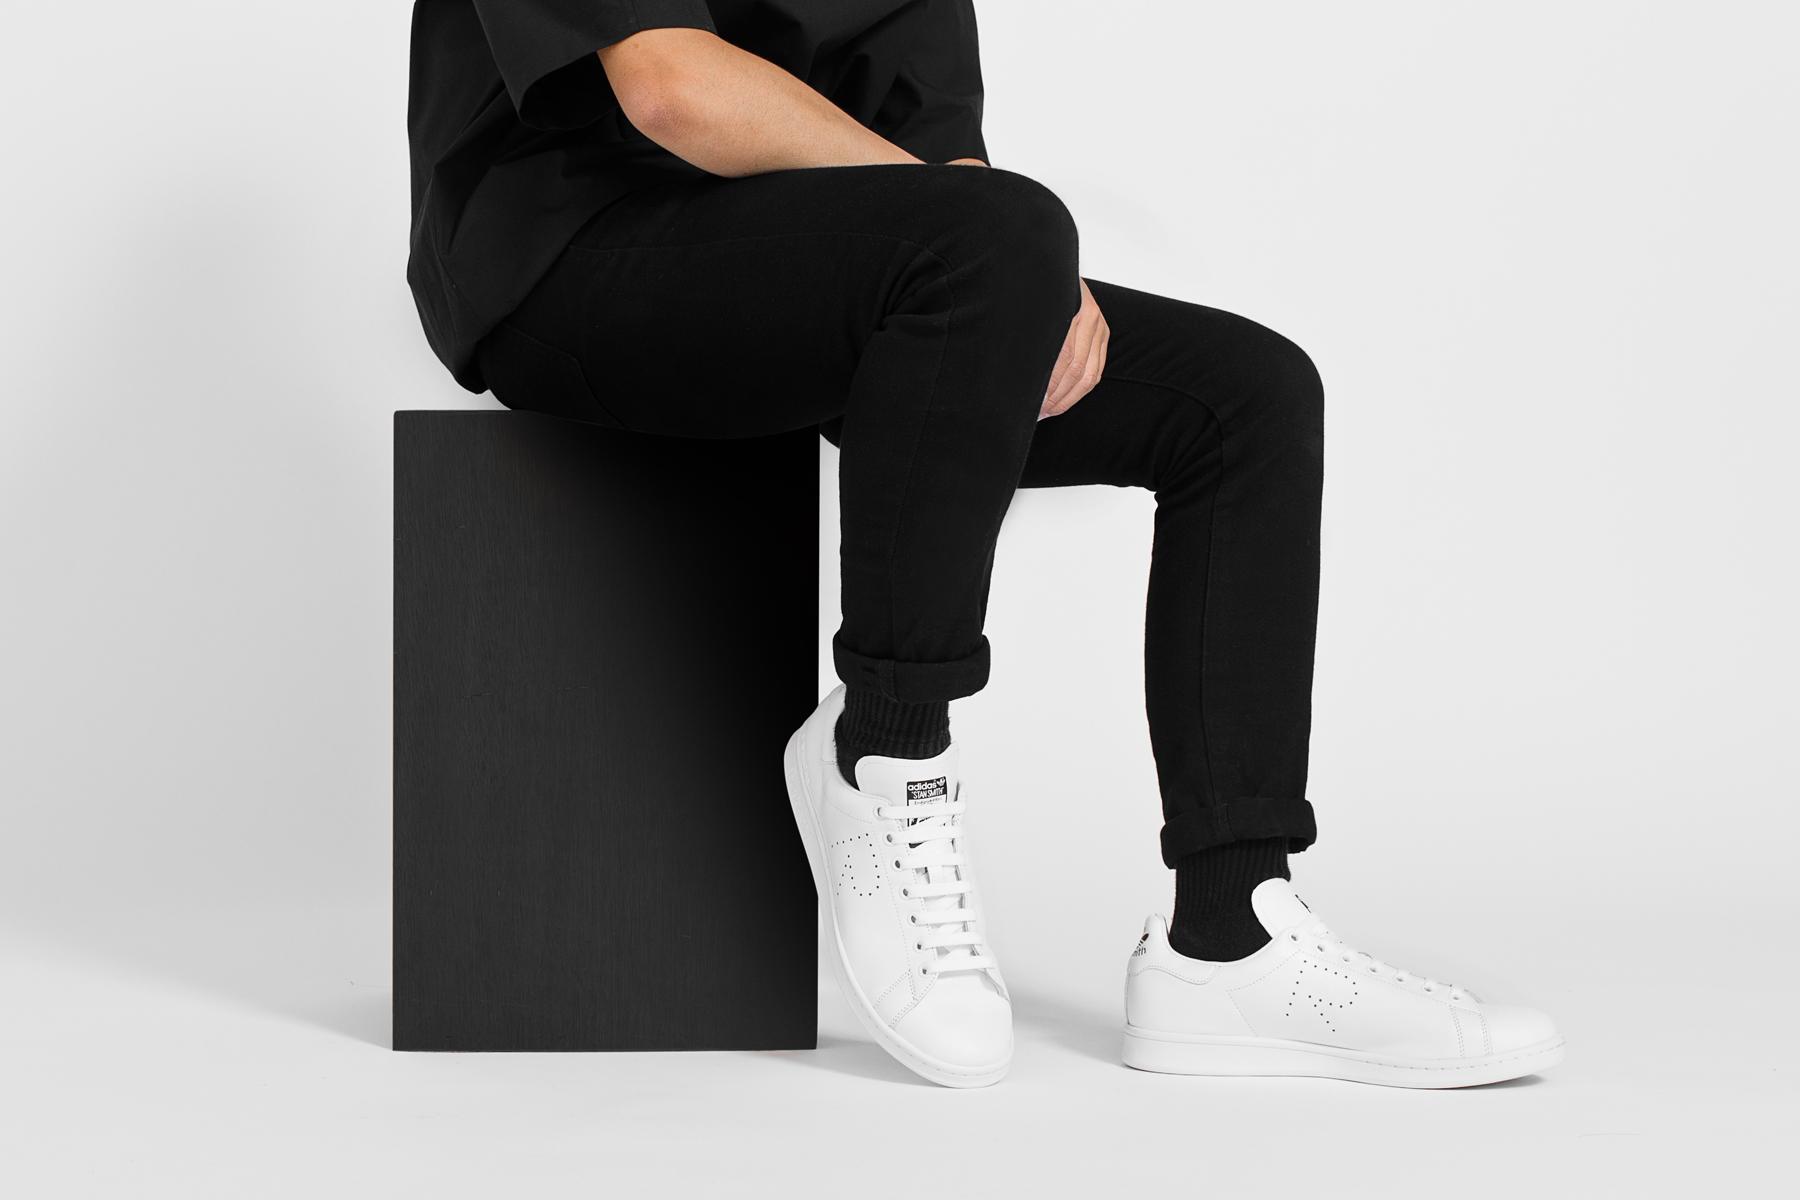 Raf Simons x adidas Originals Stan Smith 2015 Fall/Winter Collection